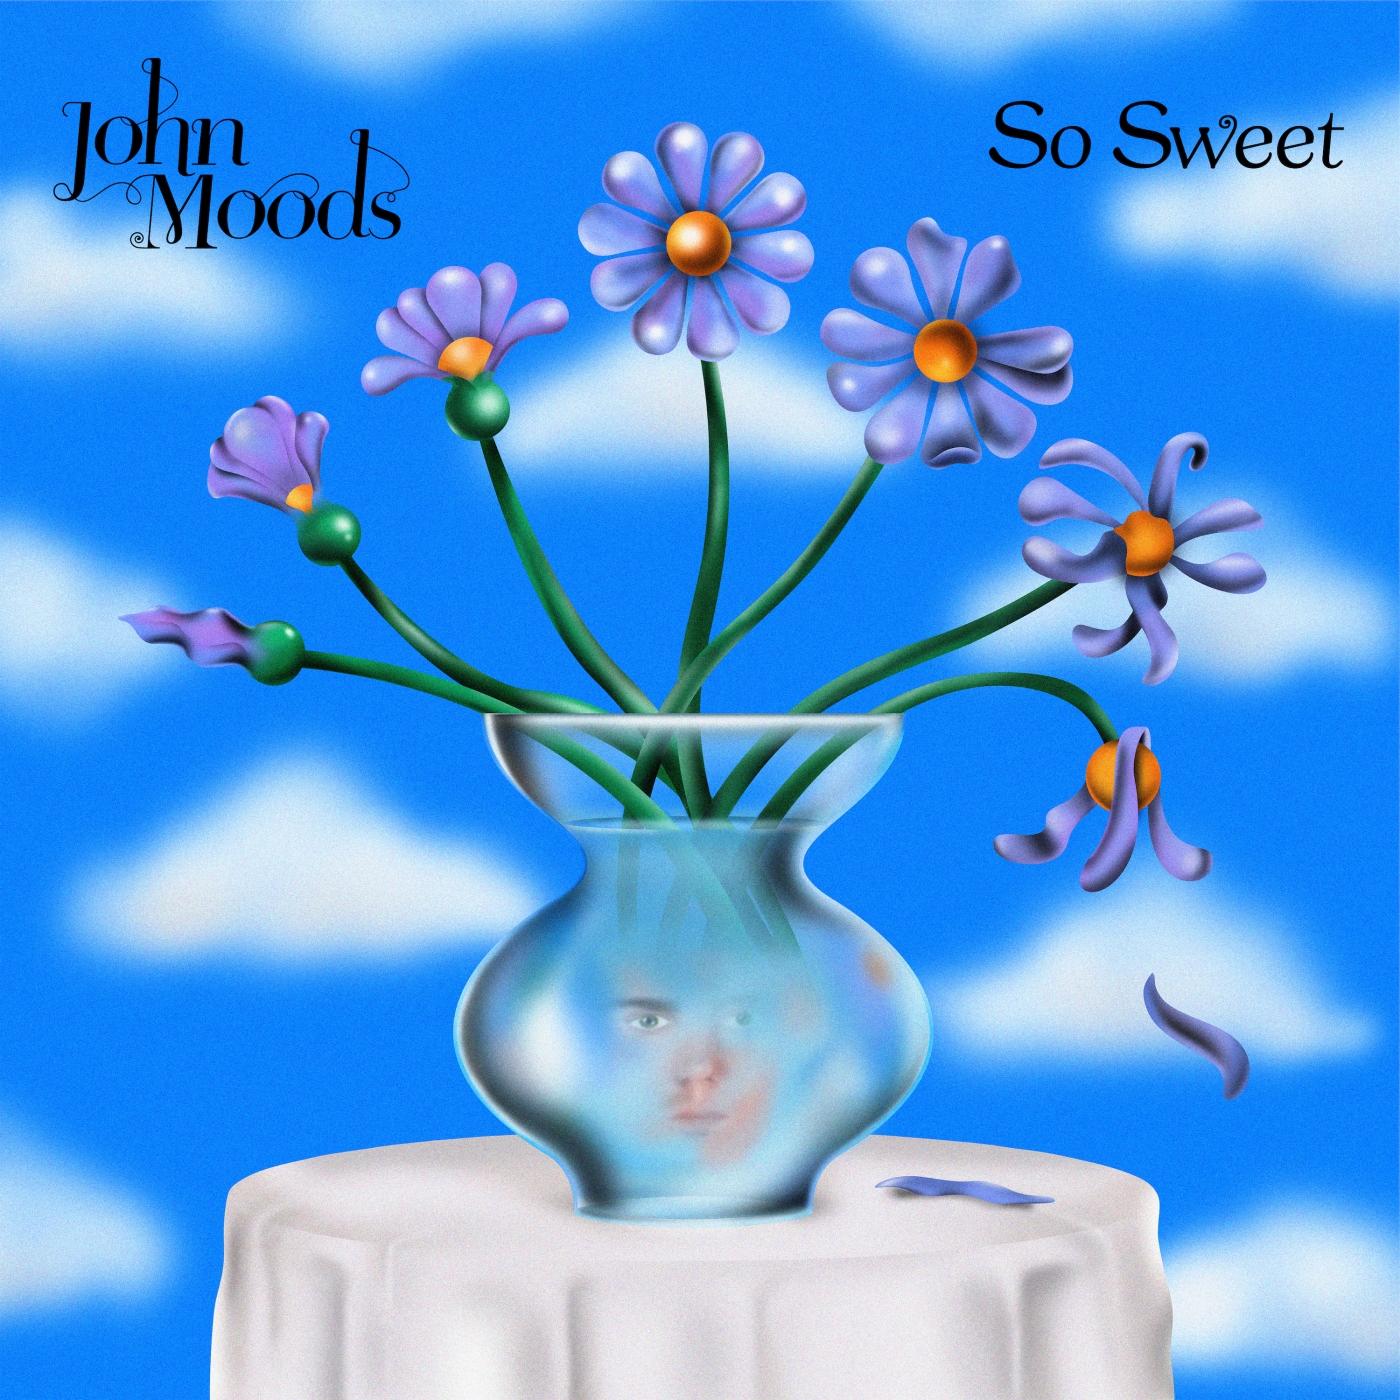 John Moods - So Sweet (EP, 2021)